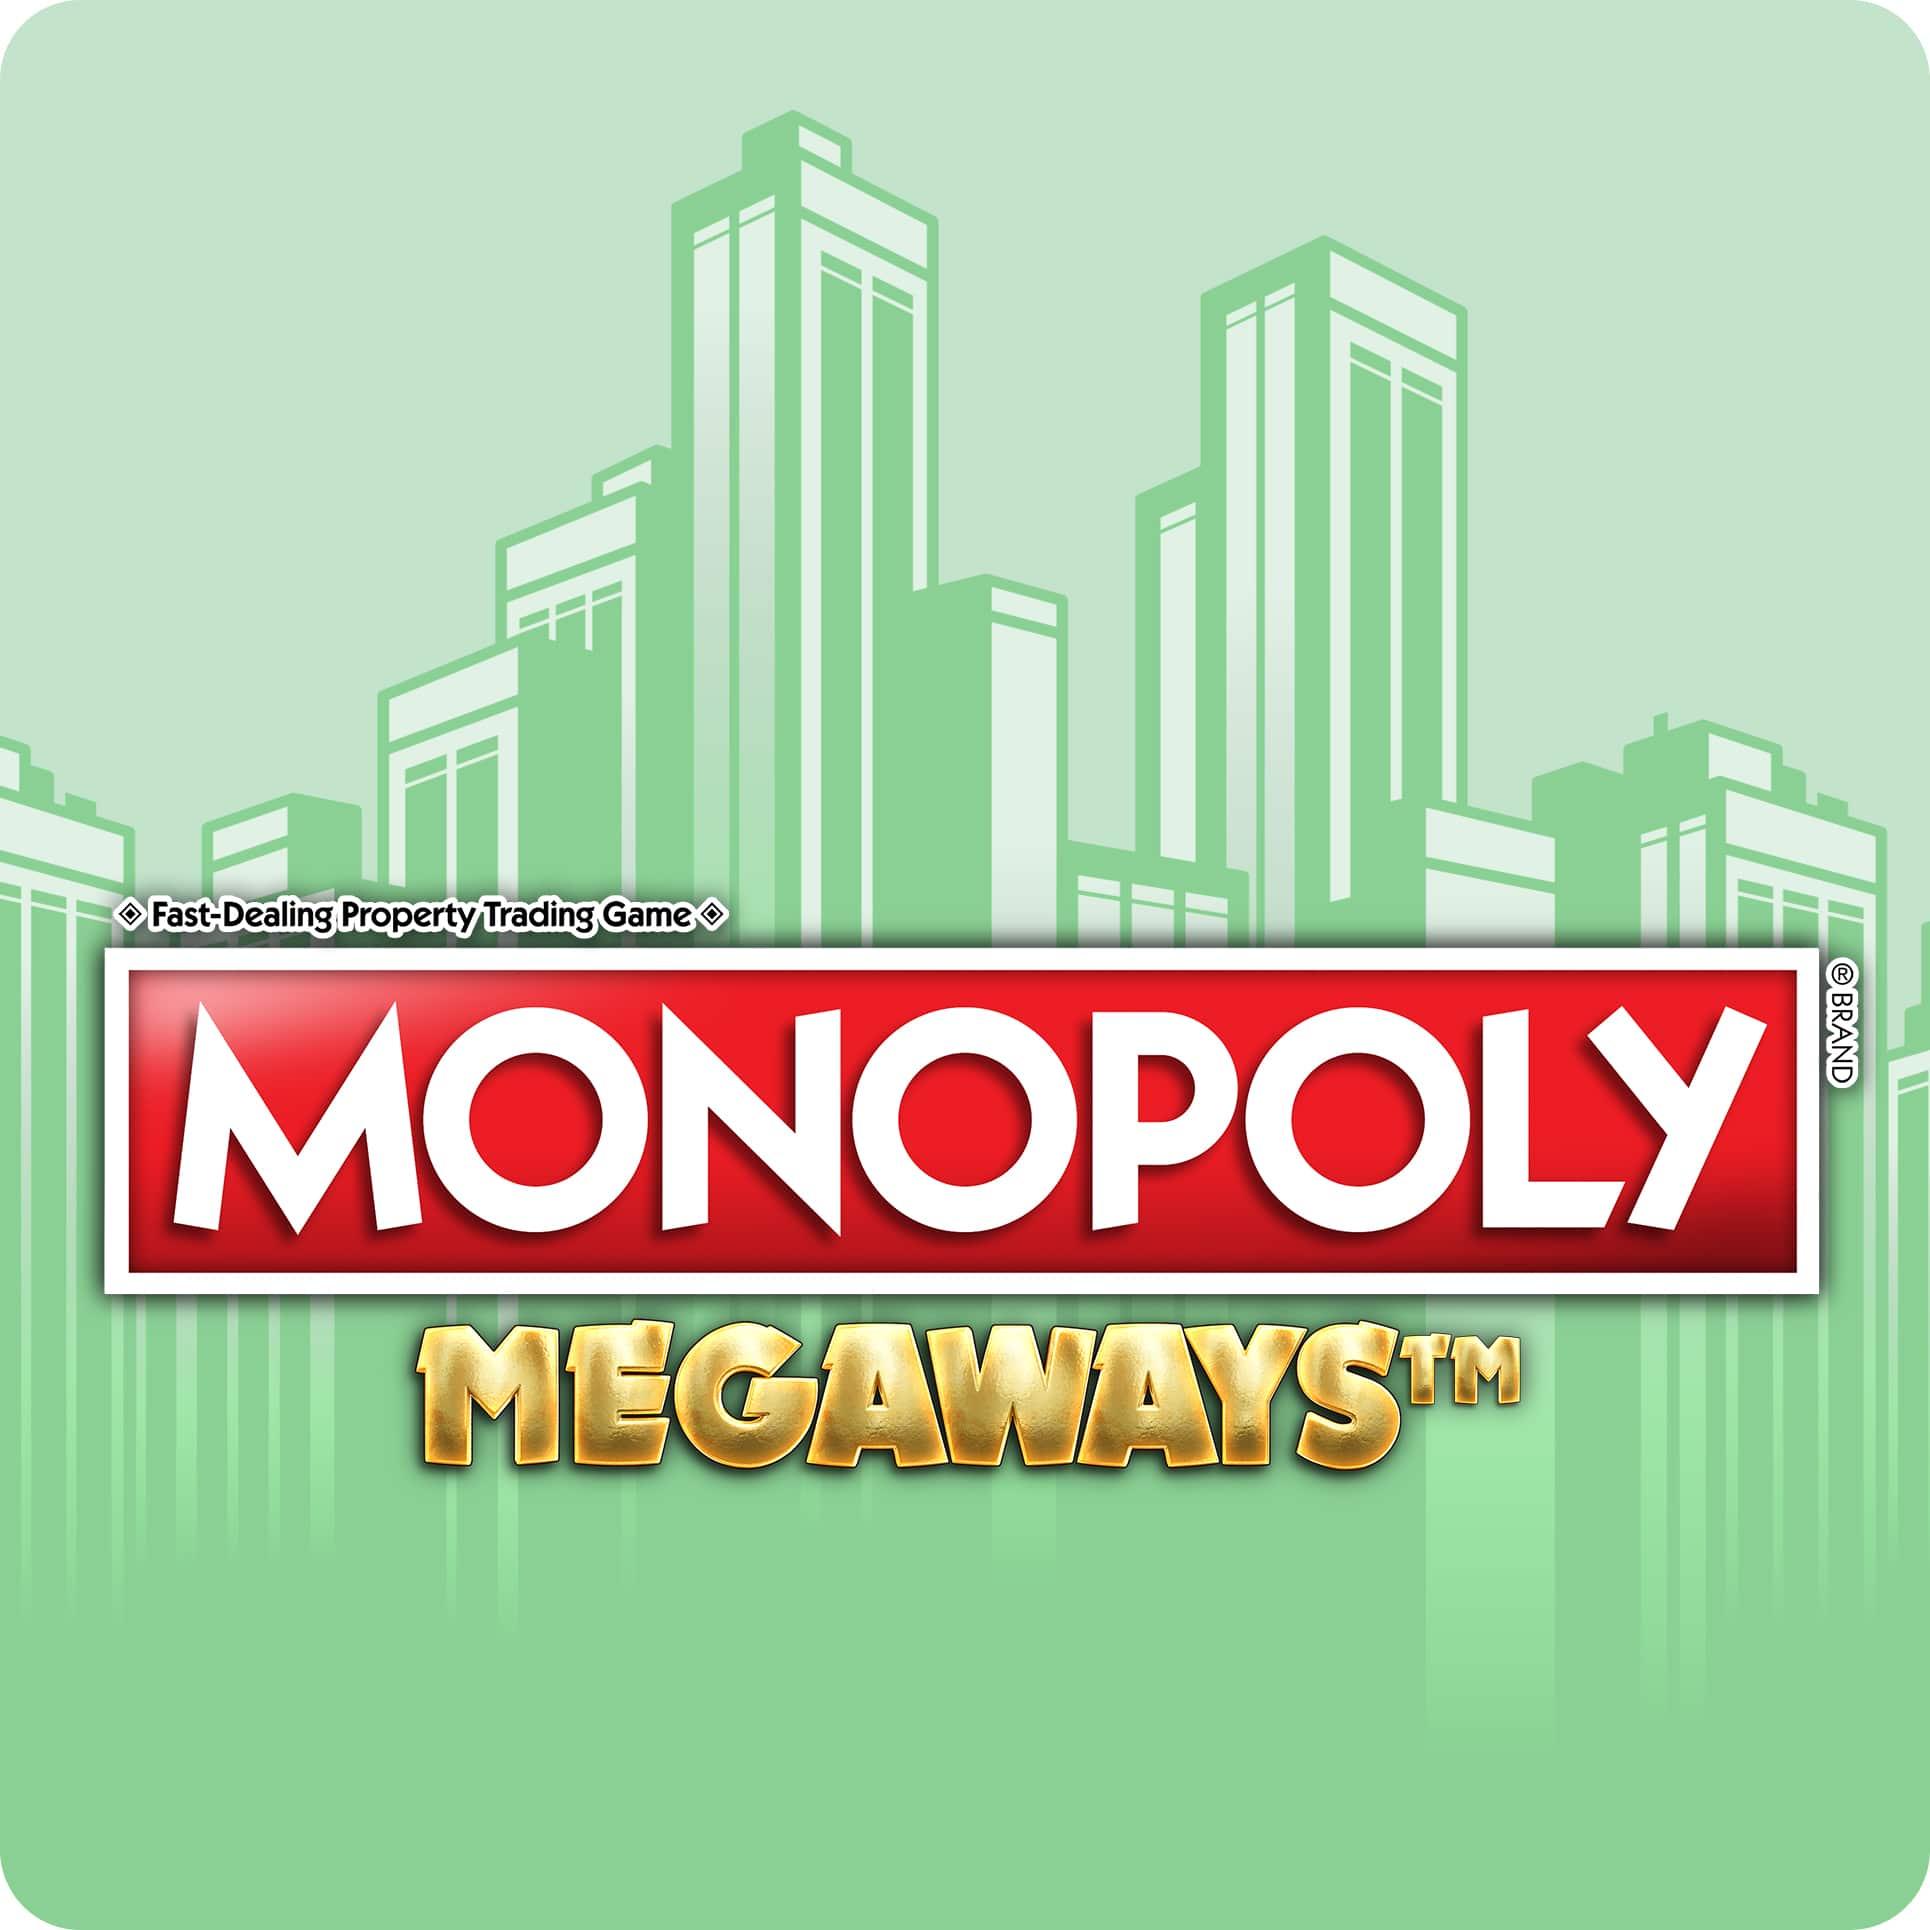 Monopoly Megaways™ - casino juego